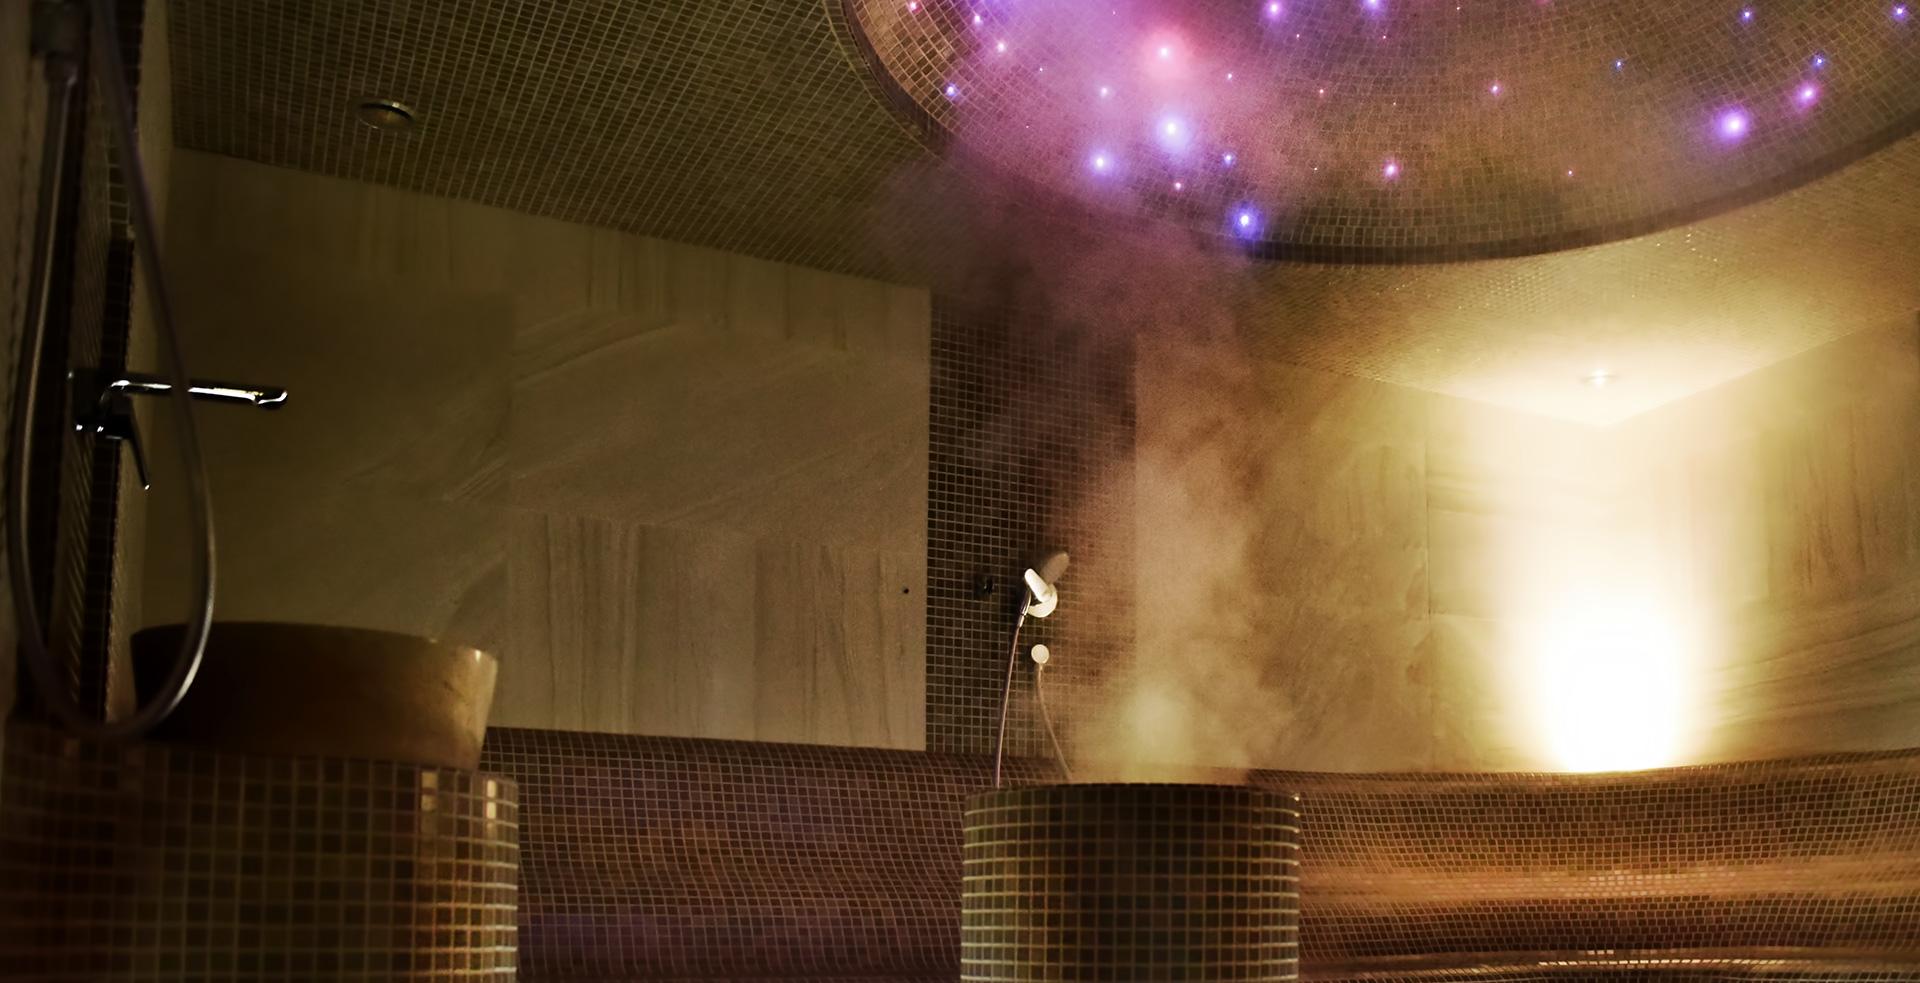 Parno tursko kupatilo u wellness i spa centru Solaris Resorta